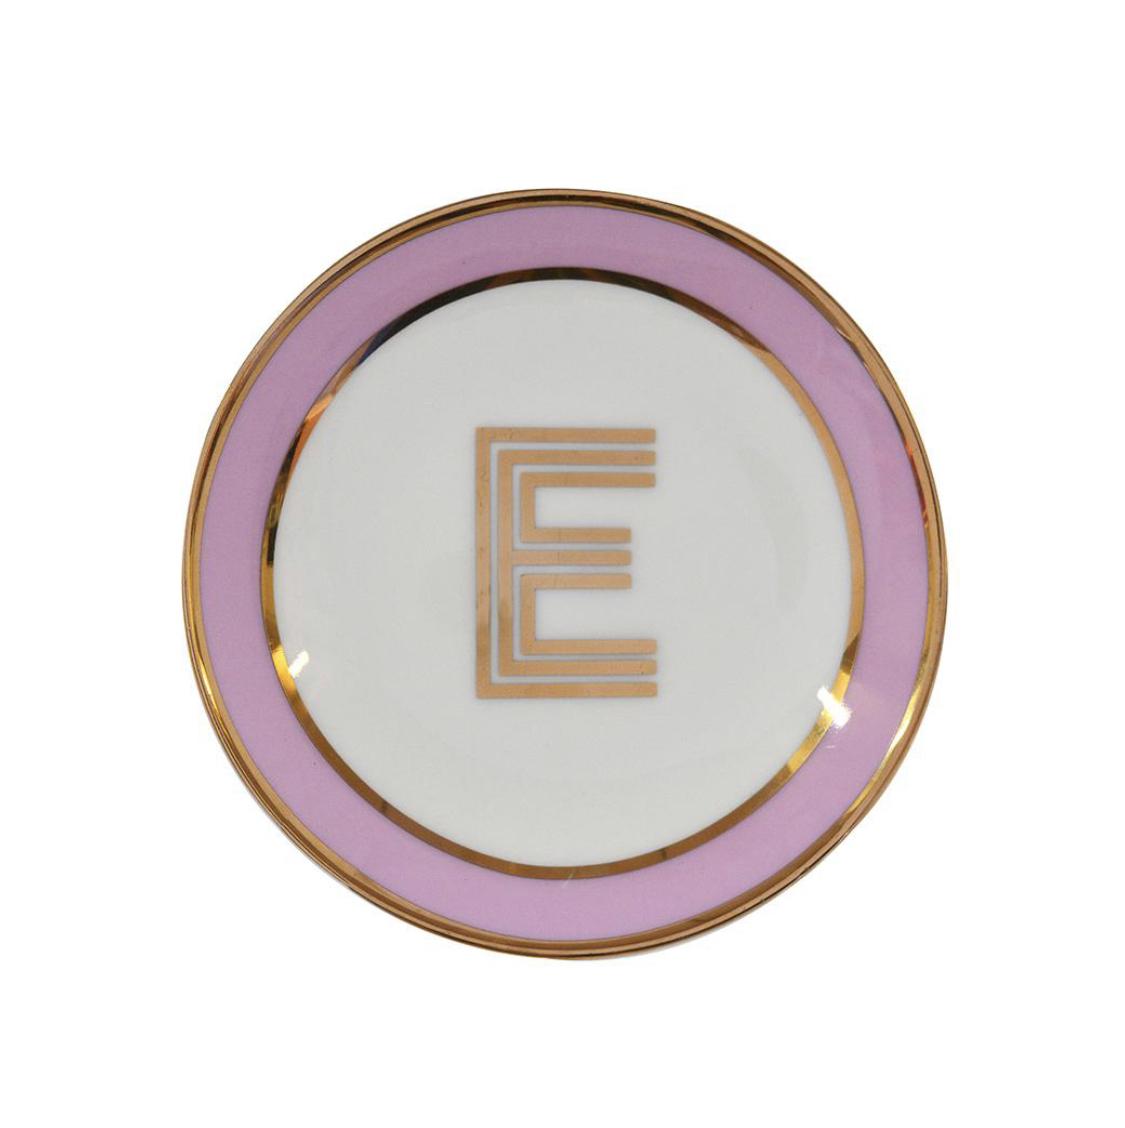 Bombay Duck Alphabet Trinket Dish - E